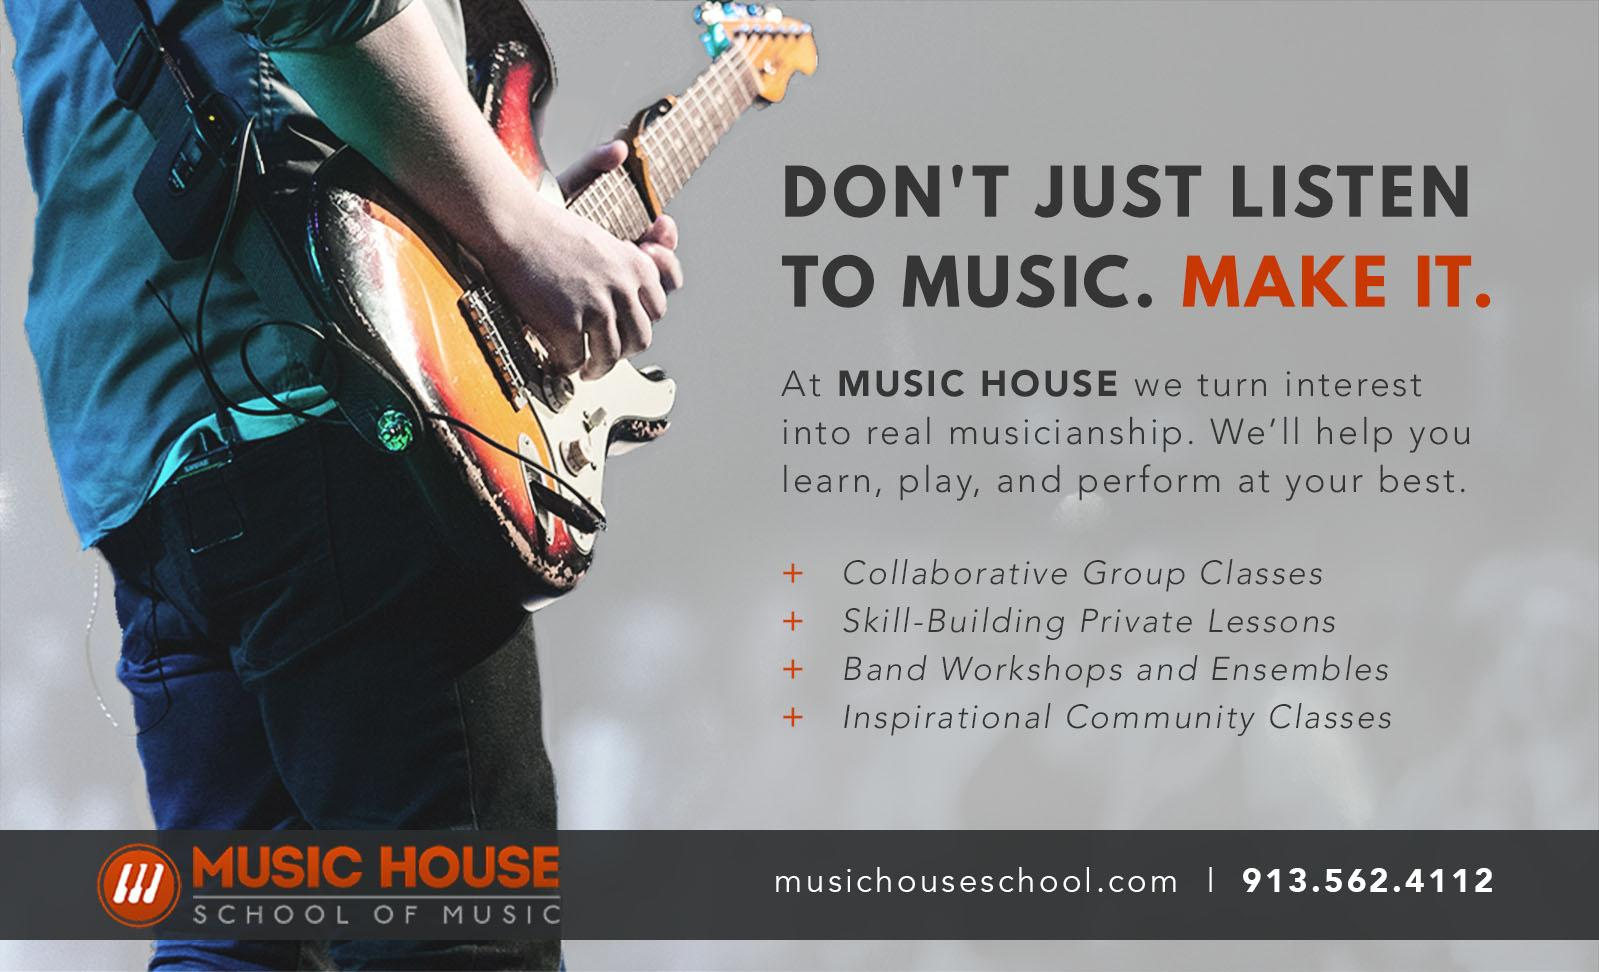 http%3A%2F%2Fwww.musichouseschool.com%2F